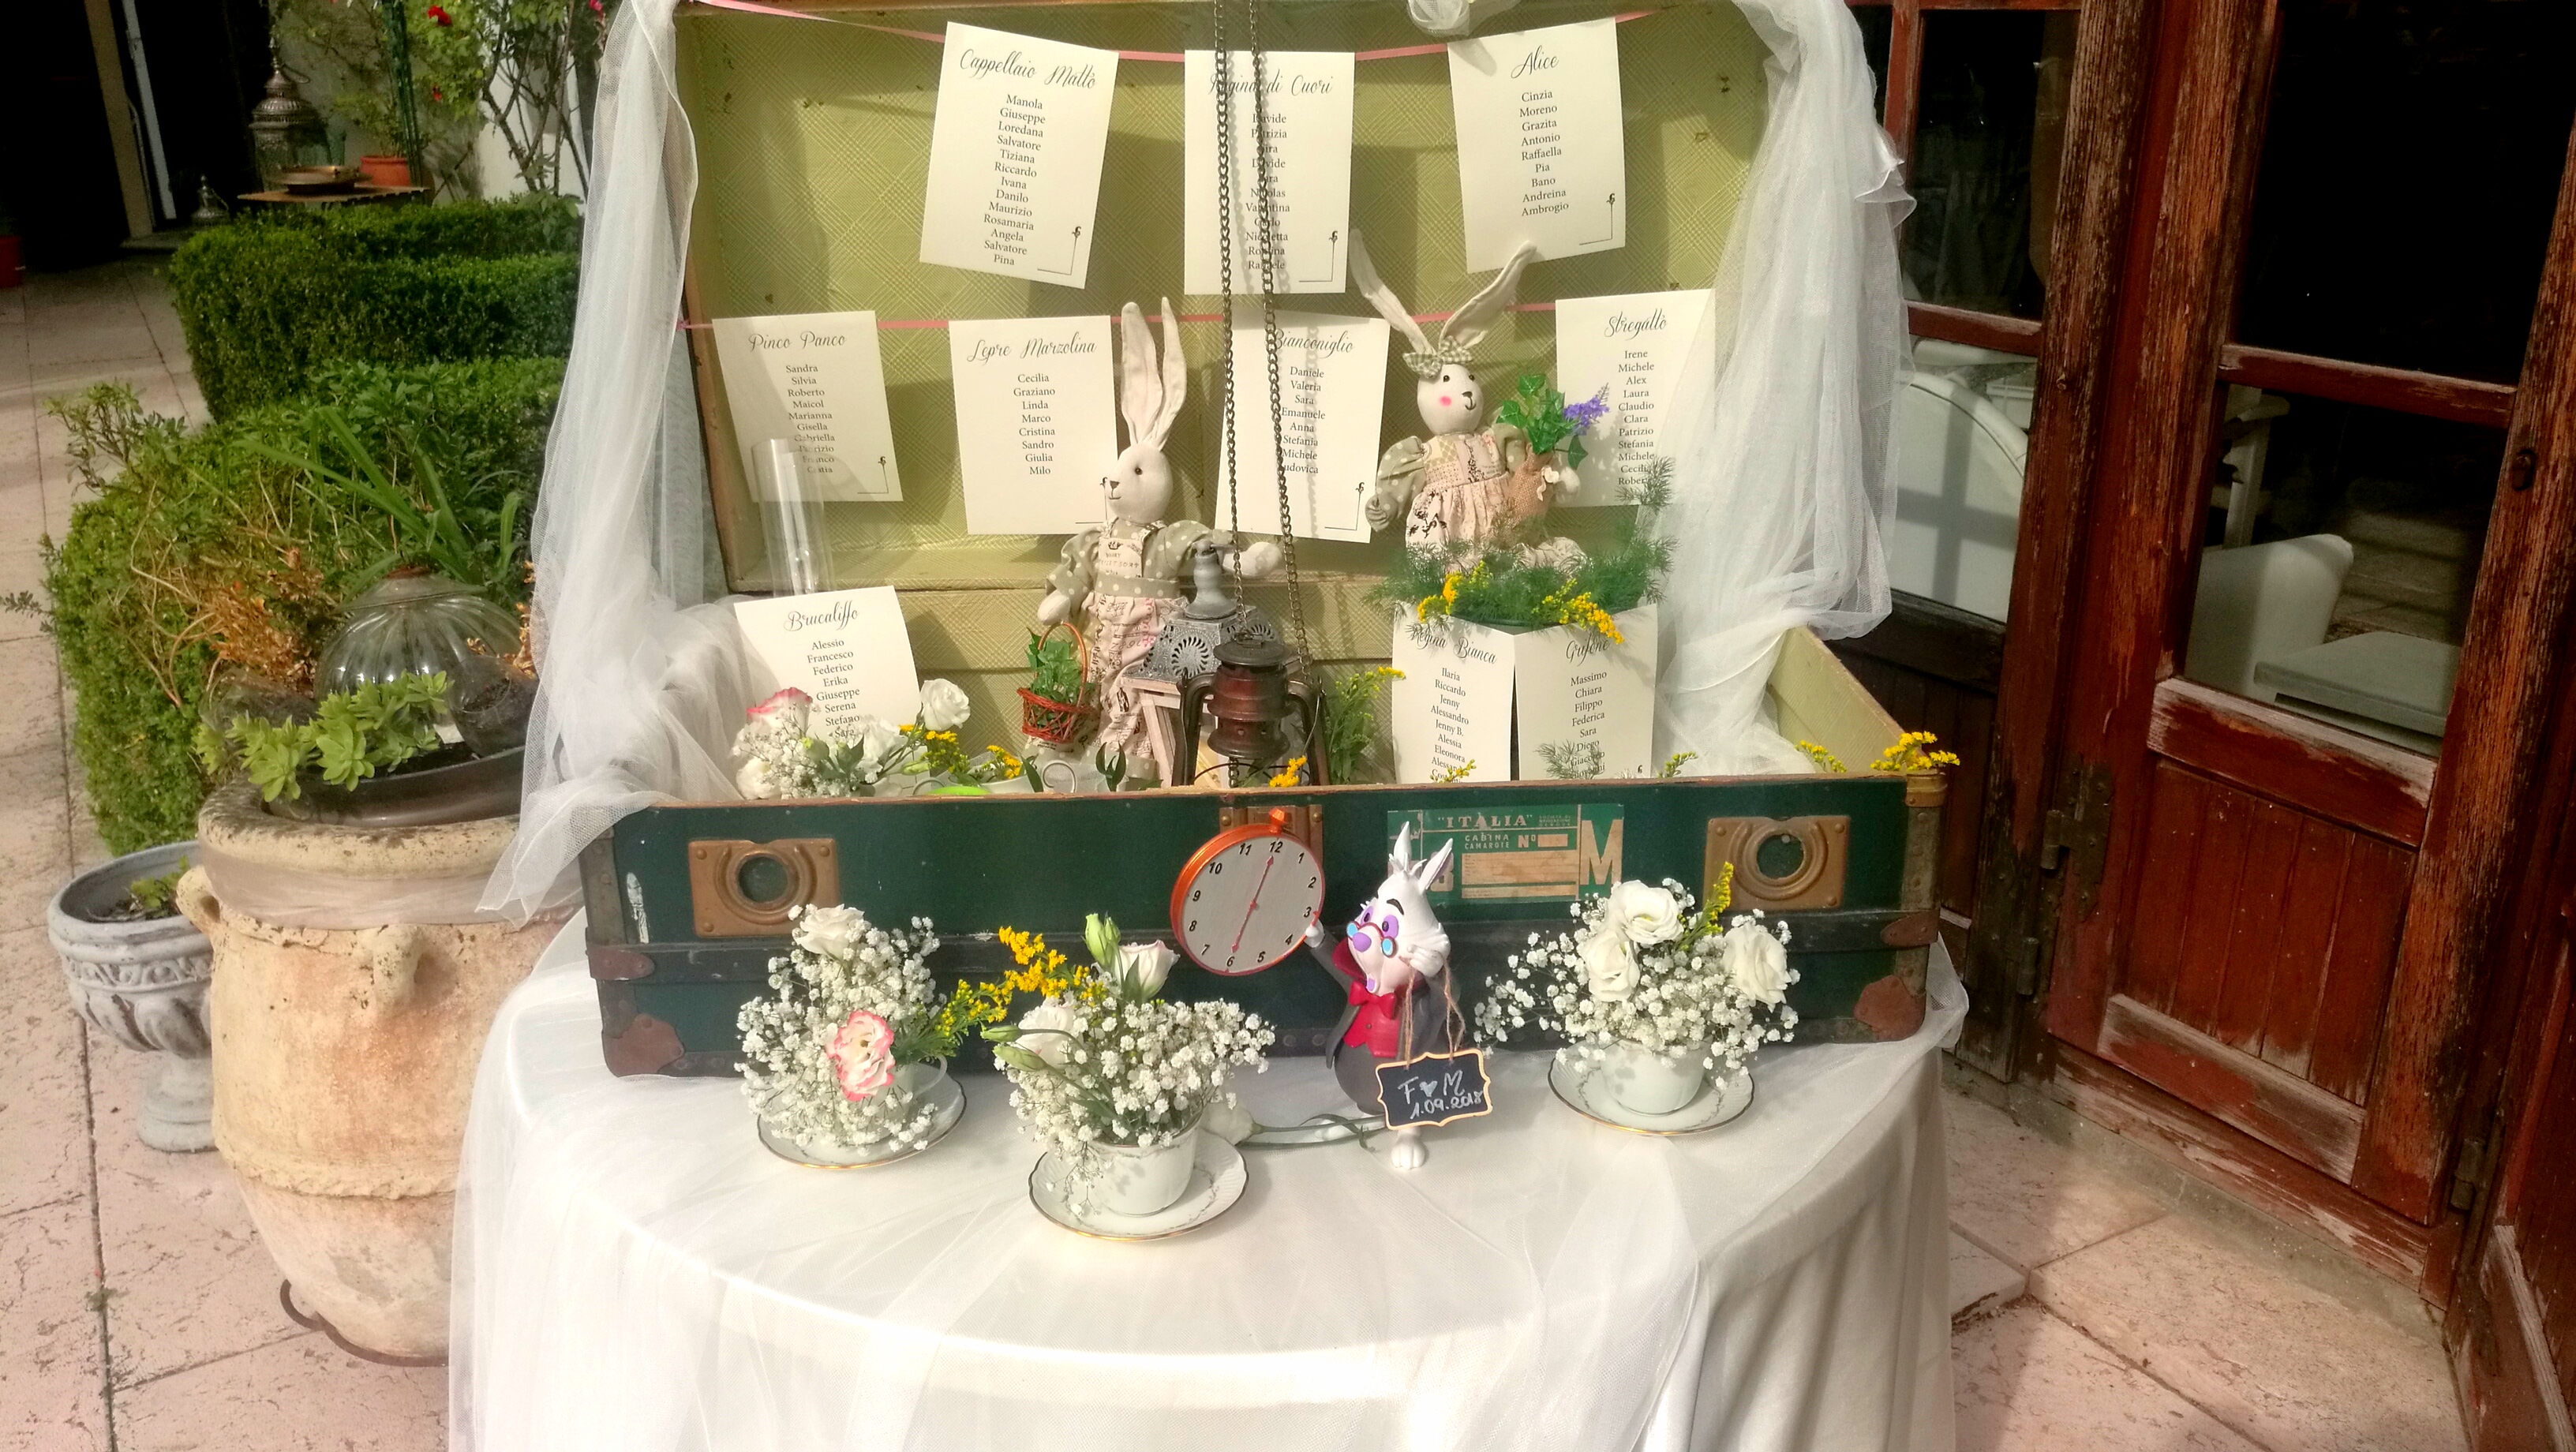 LUXURY WEDDING PLANNER - SERVIZIO GRATUITO